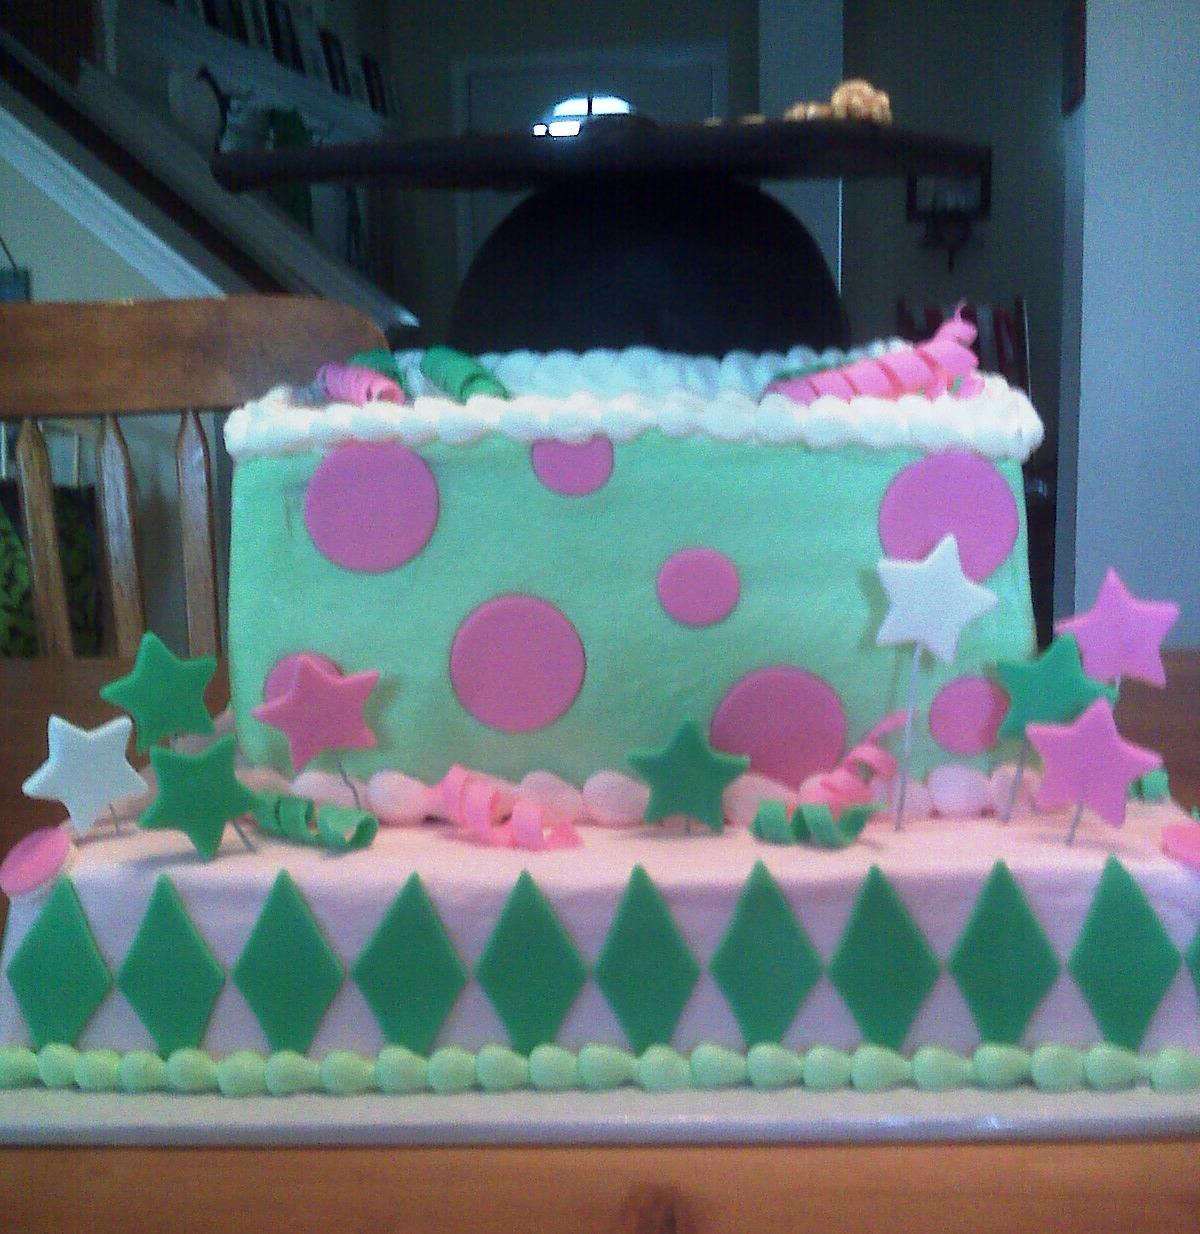 Cake Scraps: Katie's Grad Cake, Joni's Shoe Cake, Birthday